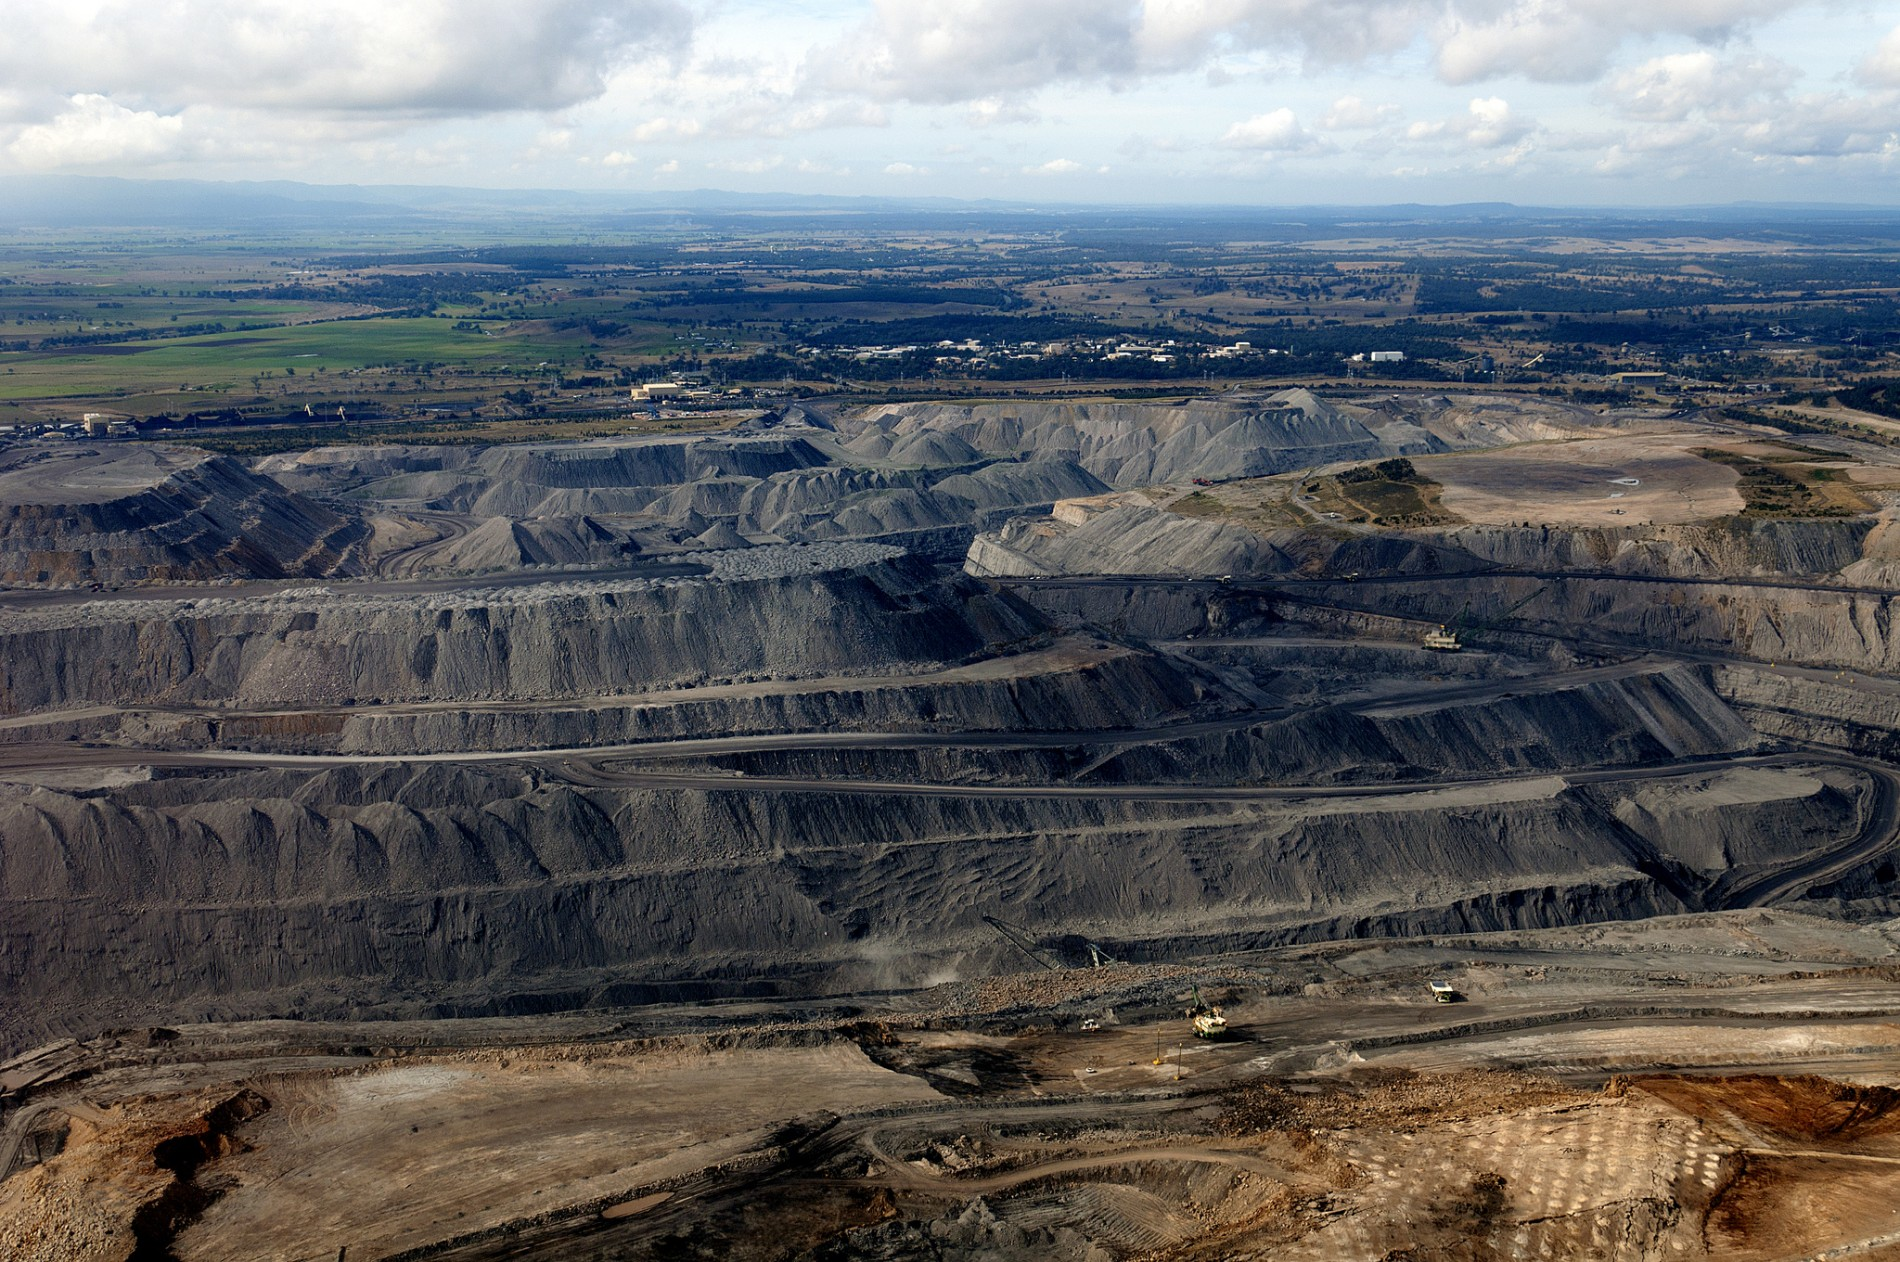 Coalmining, https://www.flickr.com/photos/beyondcoalandgas/9304143669/ by Max Phillips (Jeremy Buckingham MLC) Attribution 2.0 Generic (CC BY 2.0)